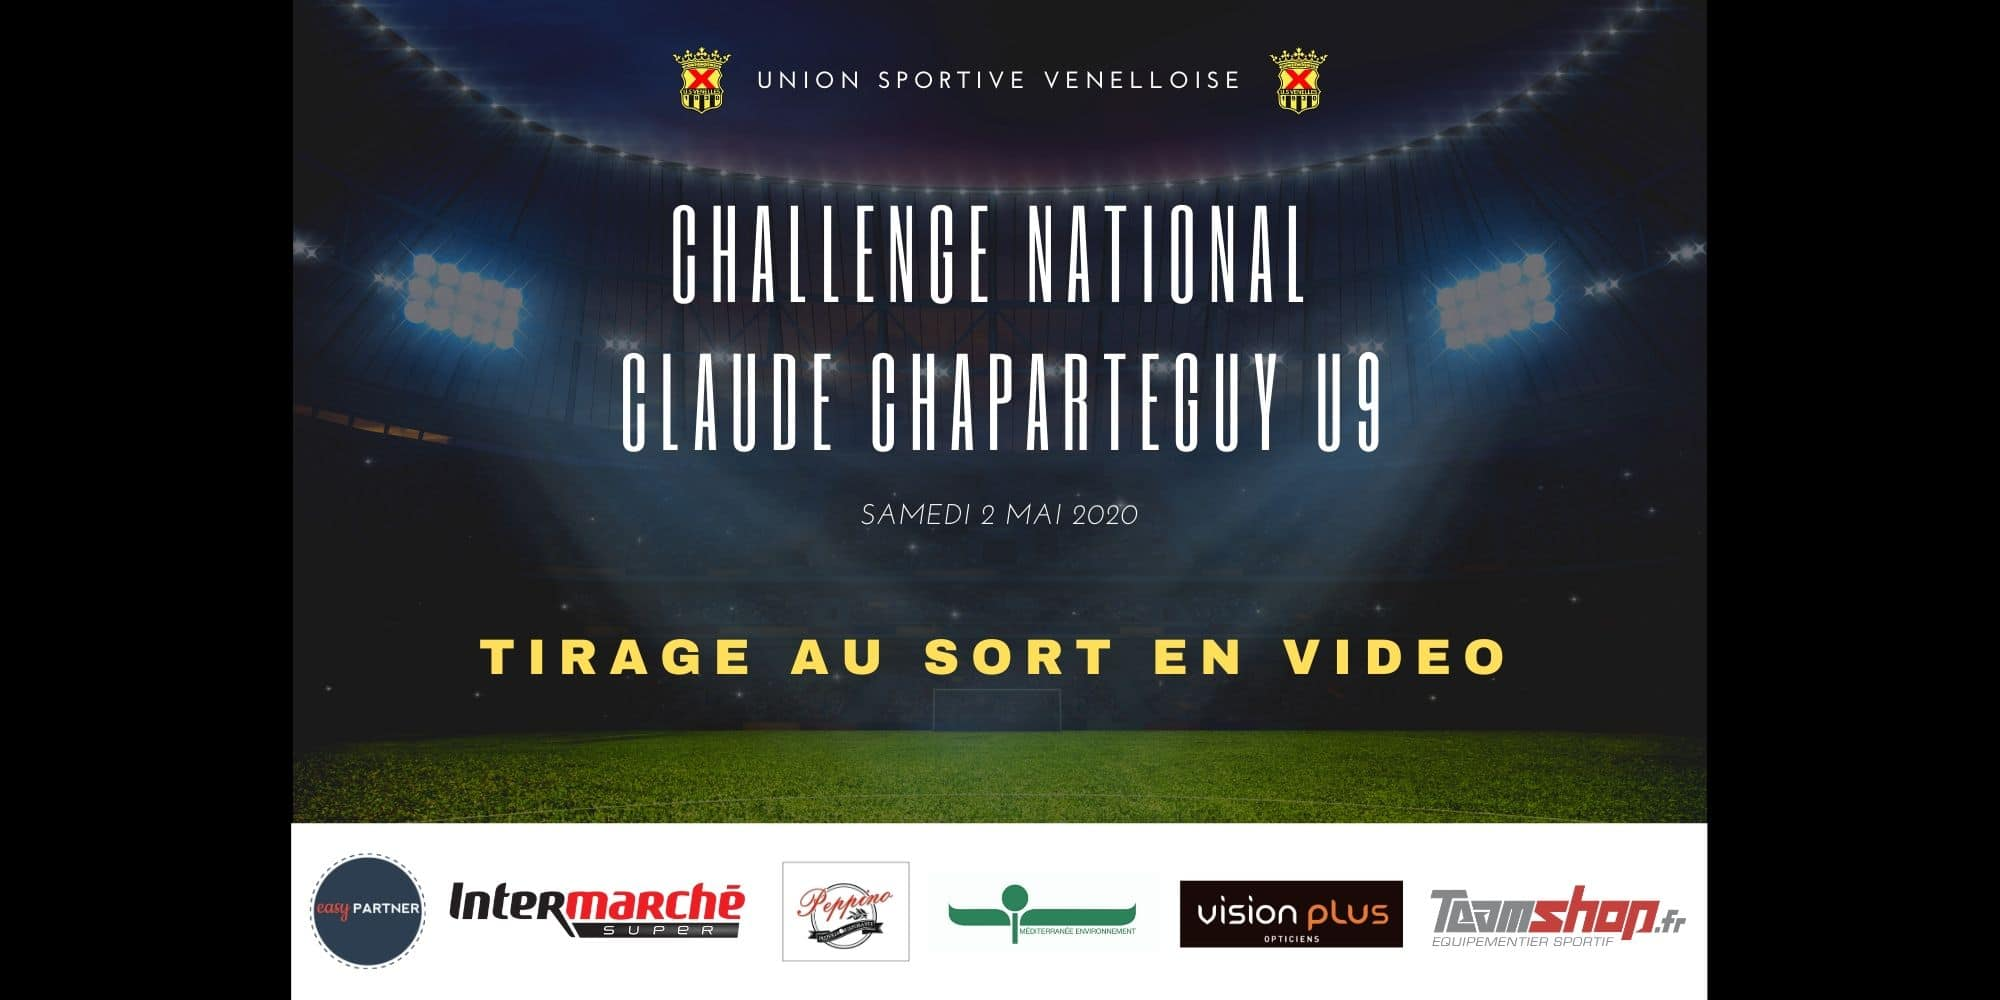 Tirage au sort Challenge National Claude Chaparteguy U9 - USV